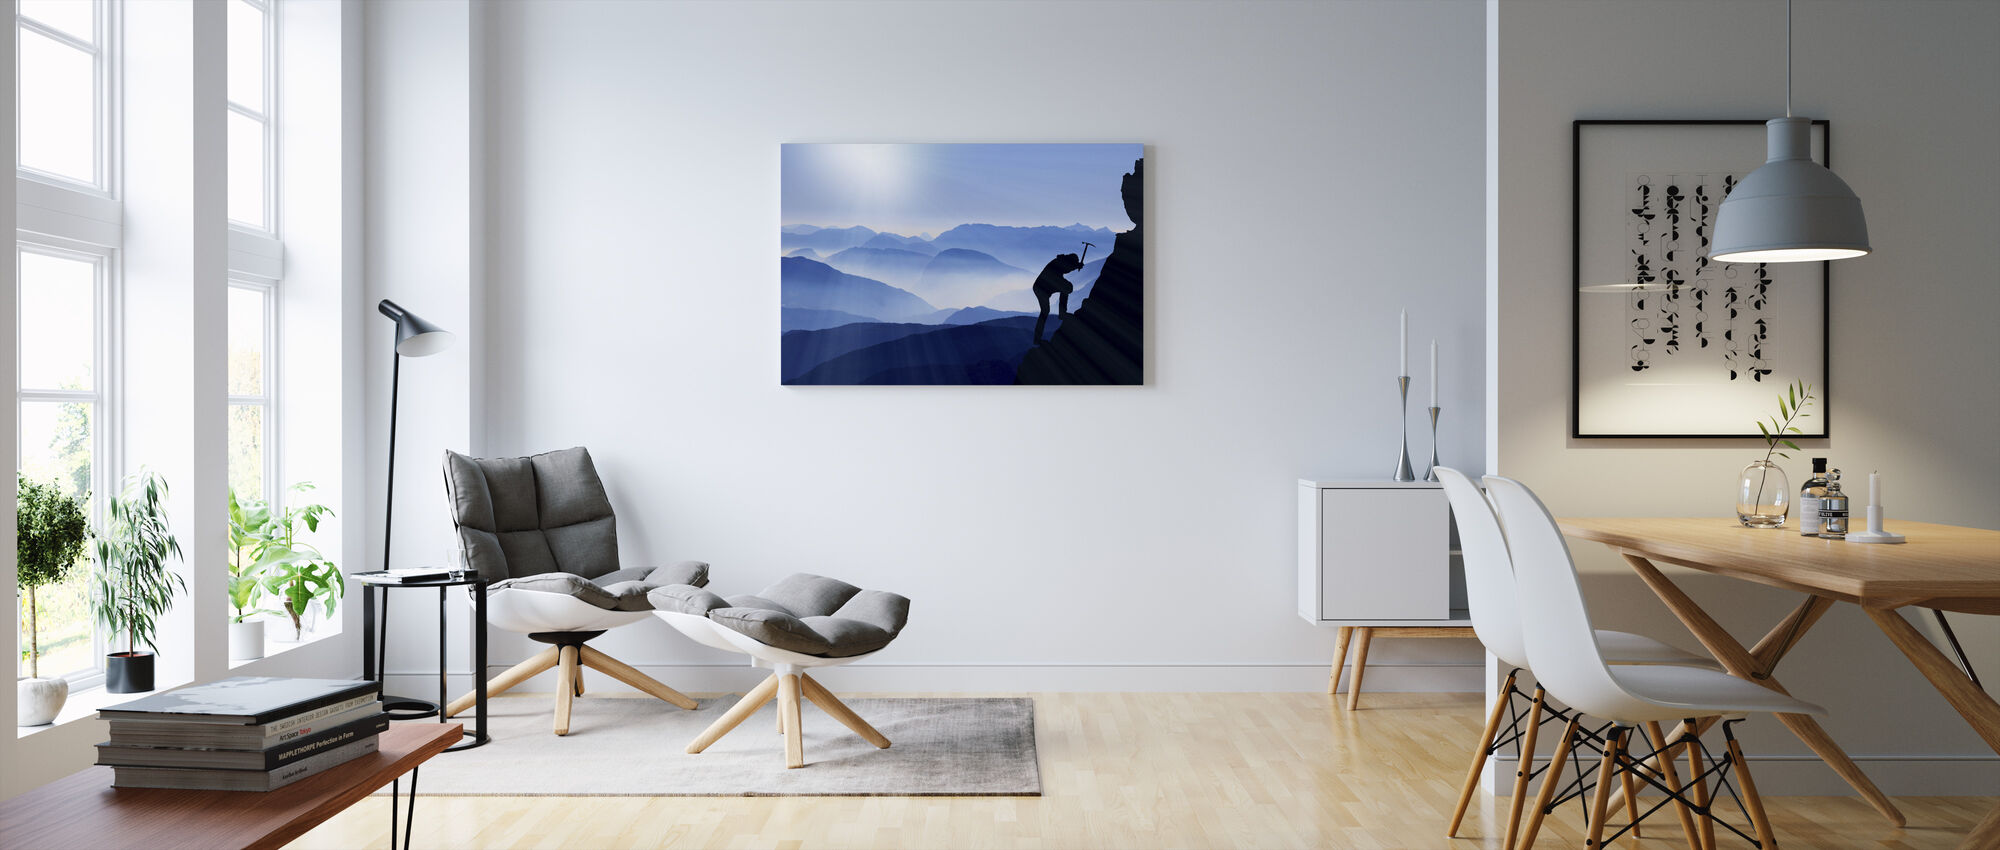 The Climb - Canvas print - Living Room